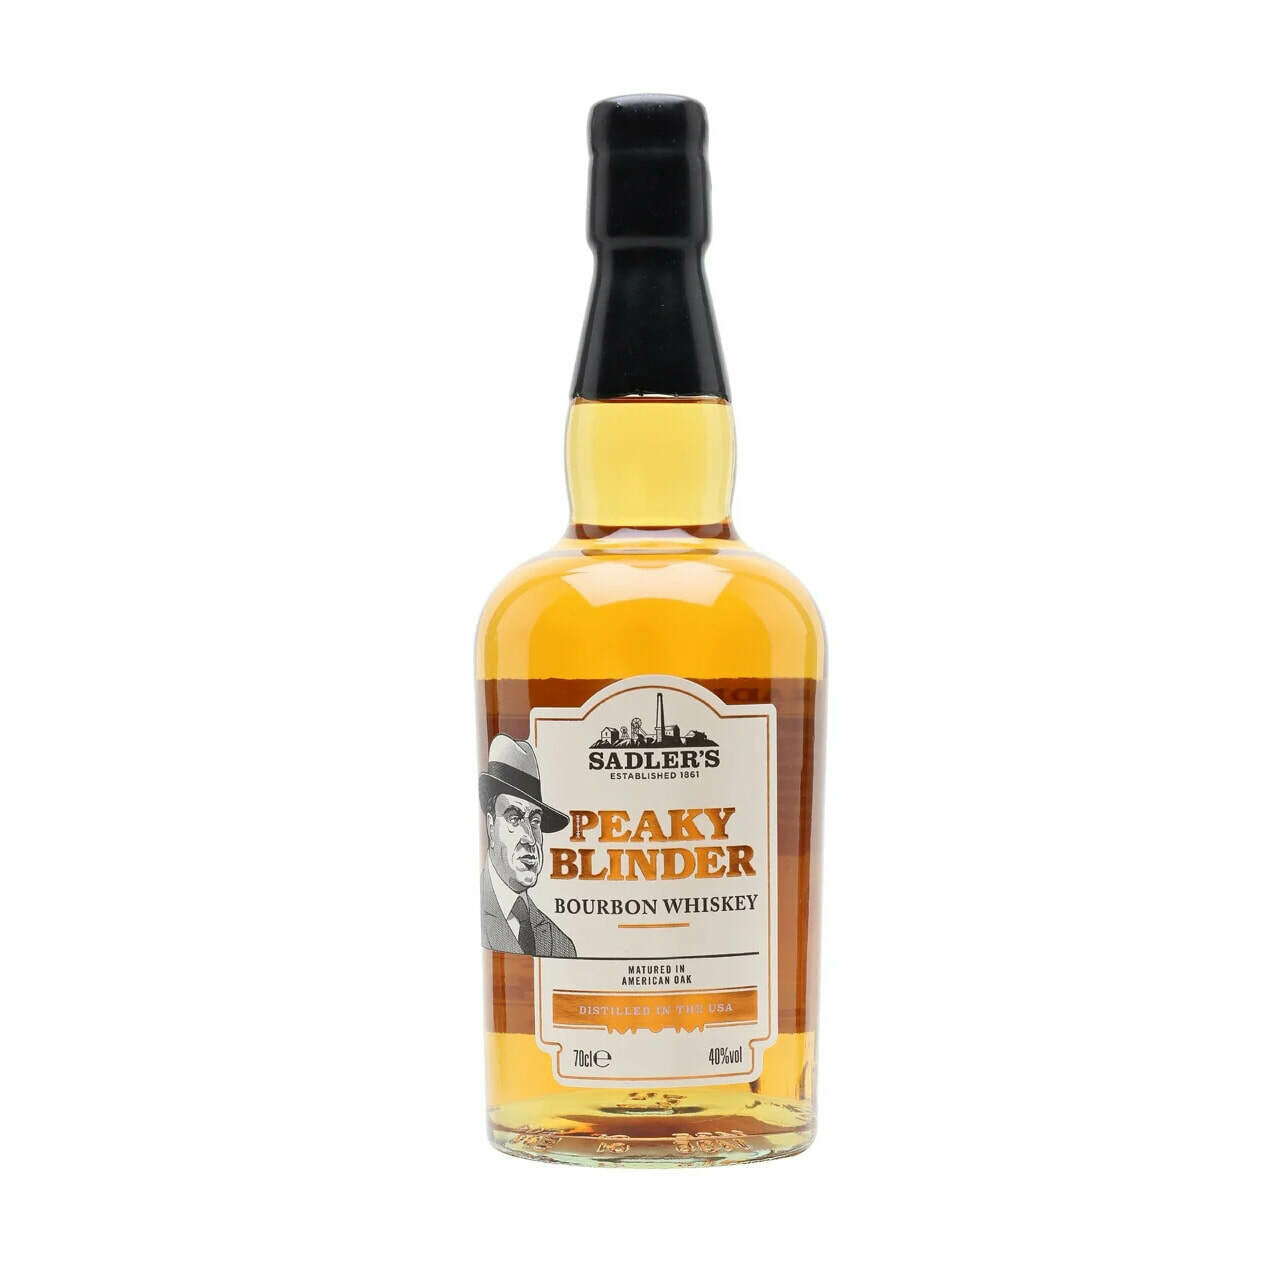 Peaky Blinder Bourbon